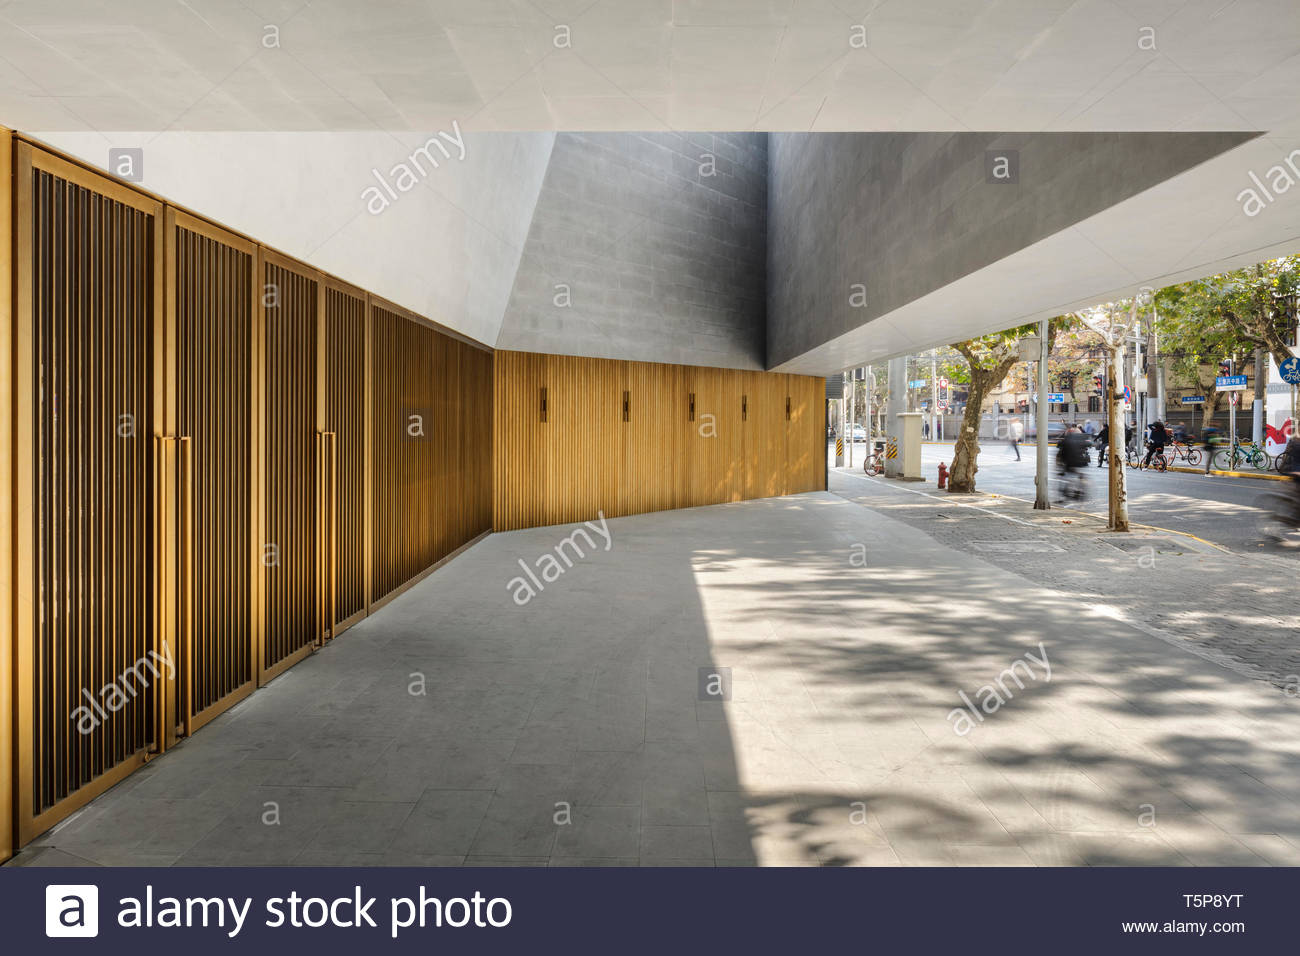 Ingresso al teatro. Nuovo Teatro di Shanghai, Shanghai, Cina. Architetto: Neri&Hu, 2017. Foto Stock